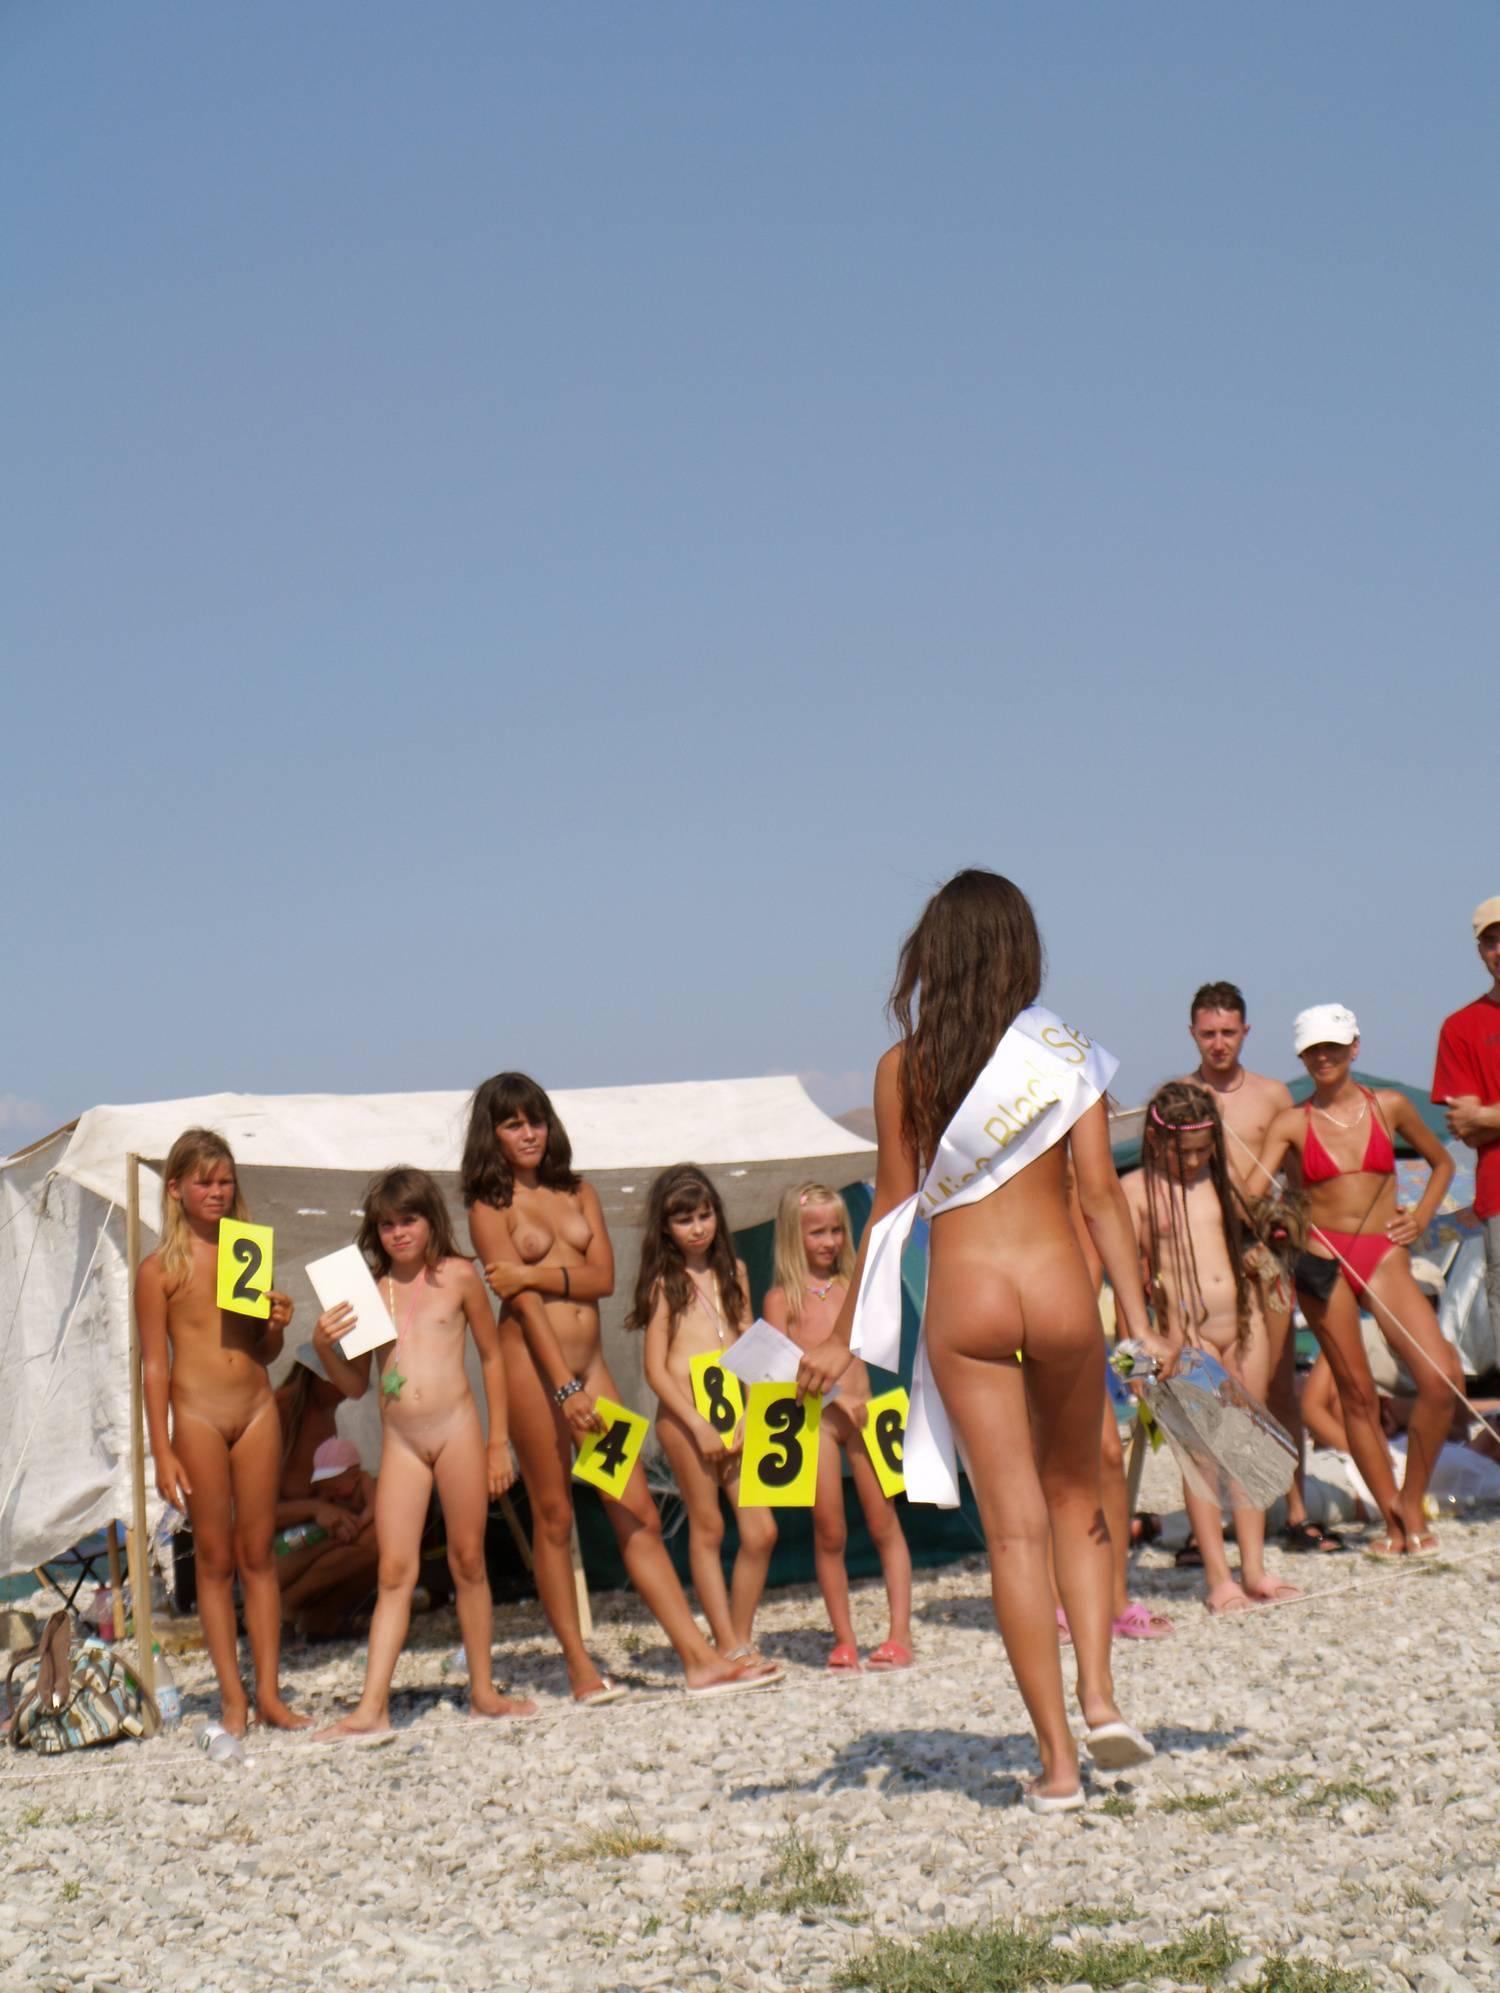 Pure Nudism Photos-Nude Jr Kids Pageant - 3